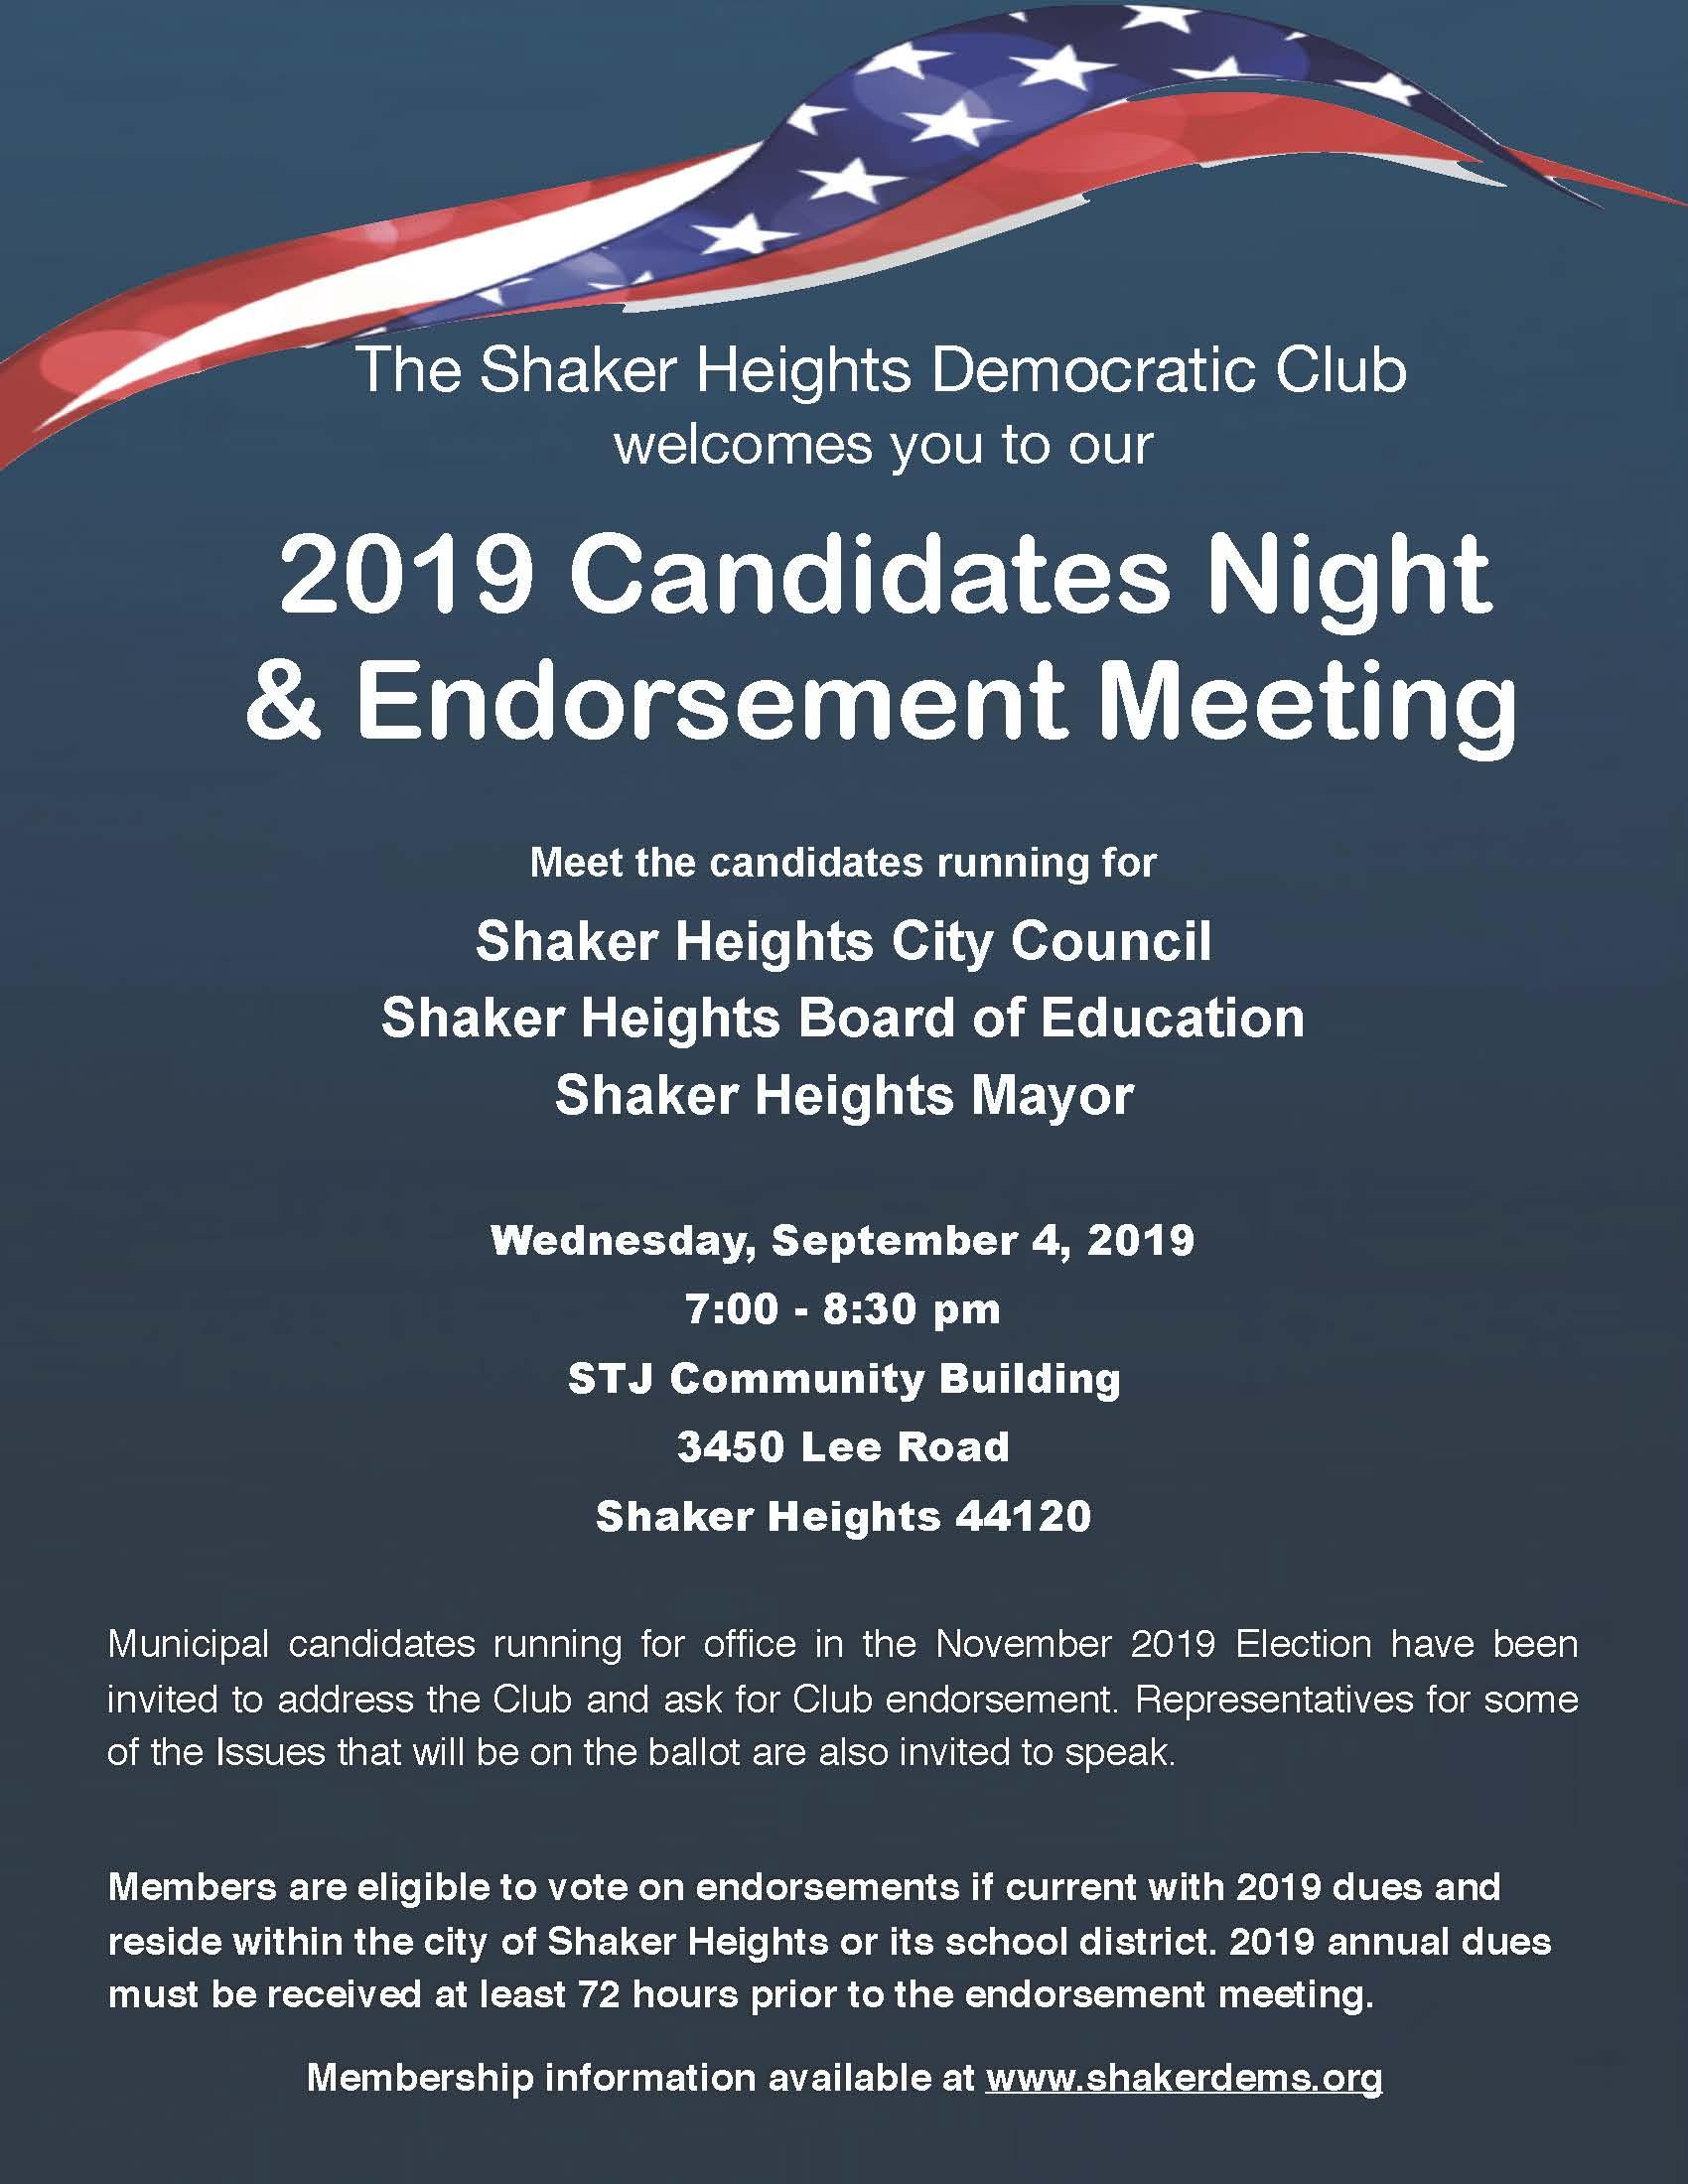 9.4.19 flyer - 2019 Endorsement Meeting.jpg